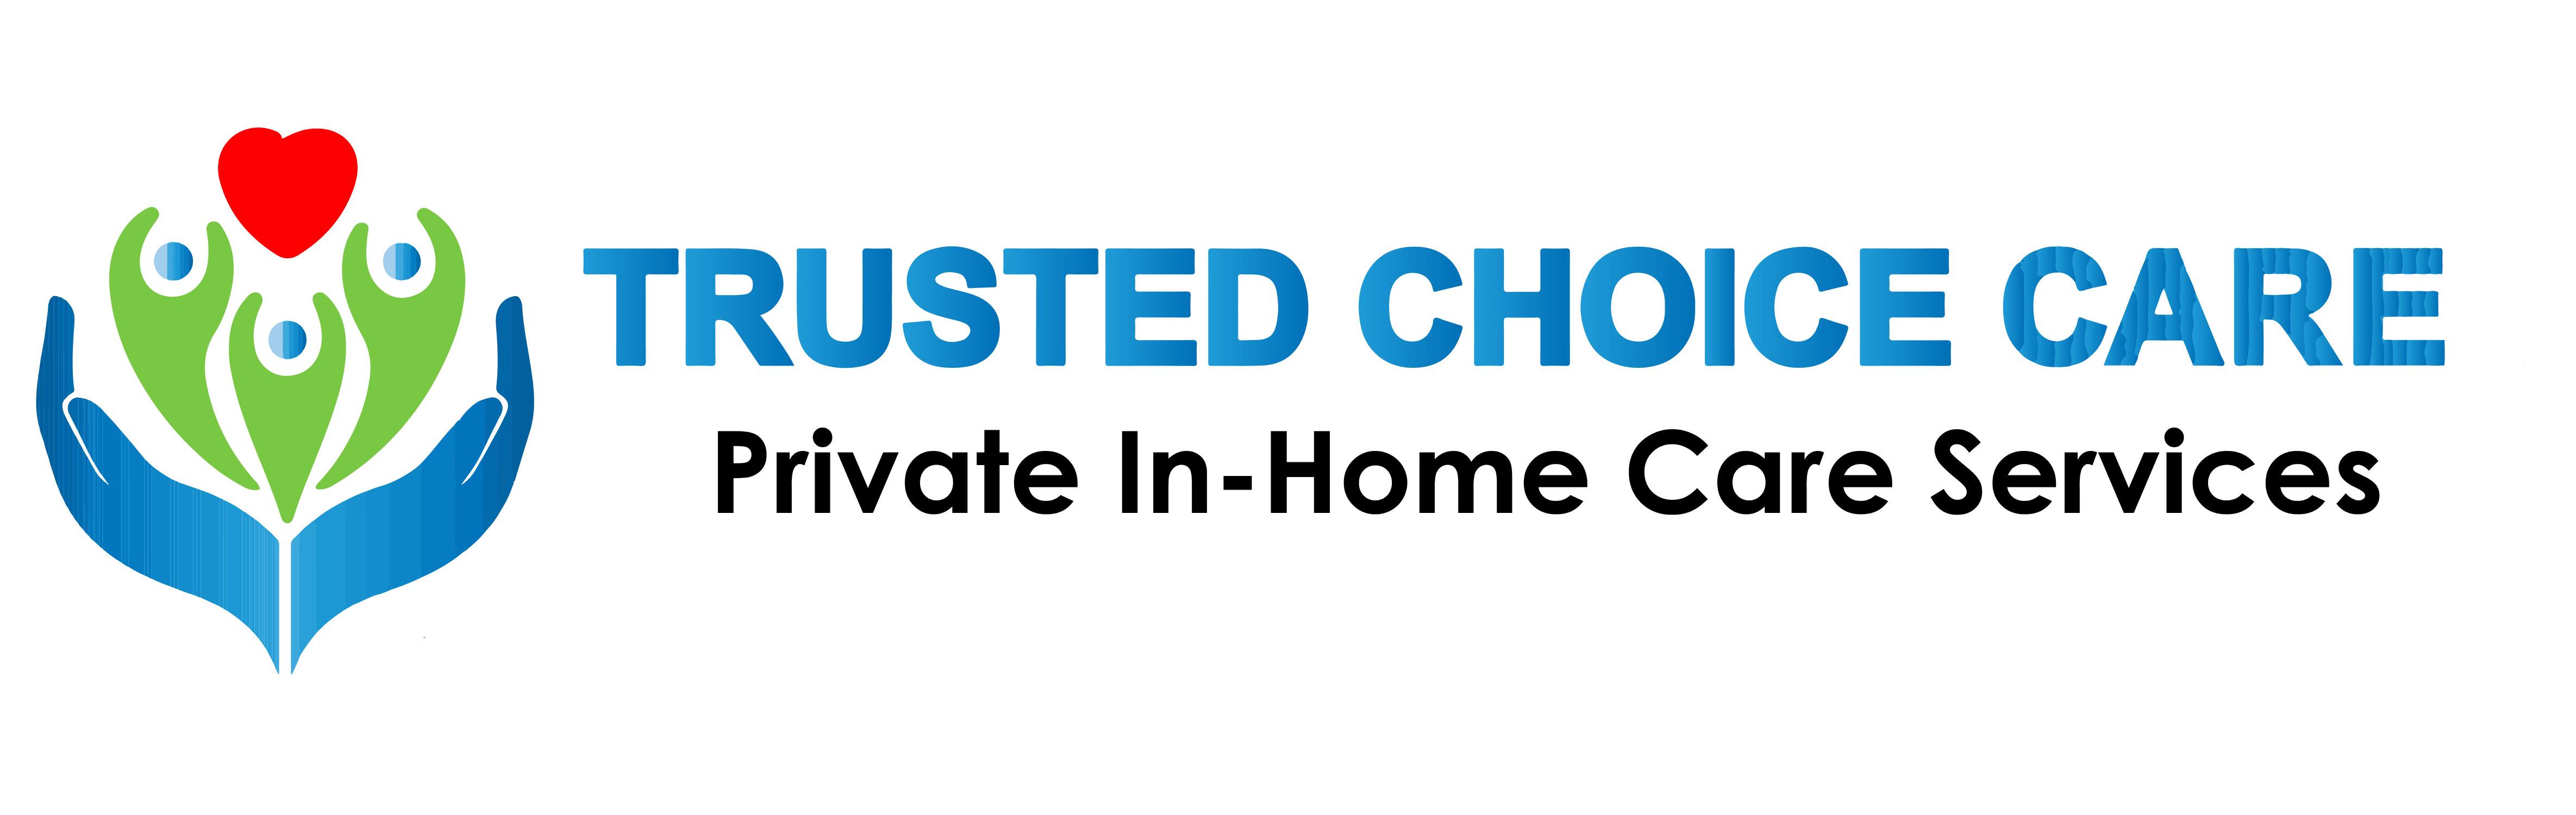 Trusted Choice Care, LLC